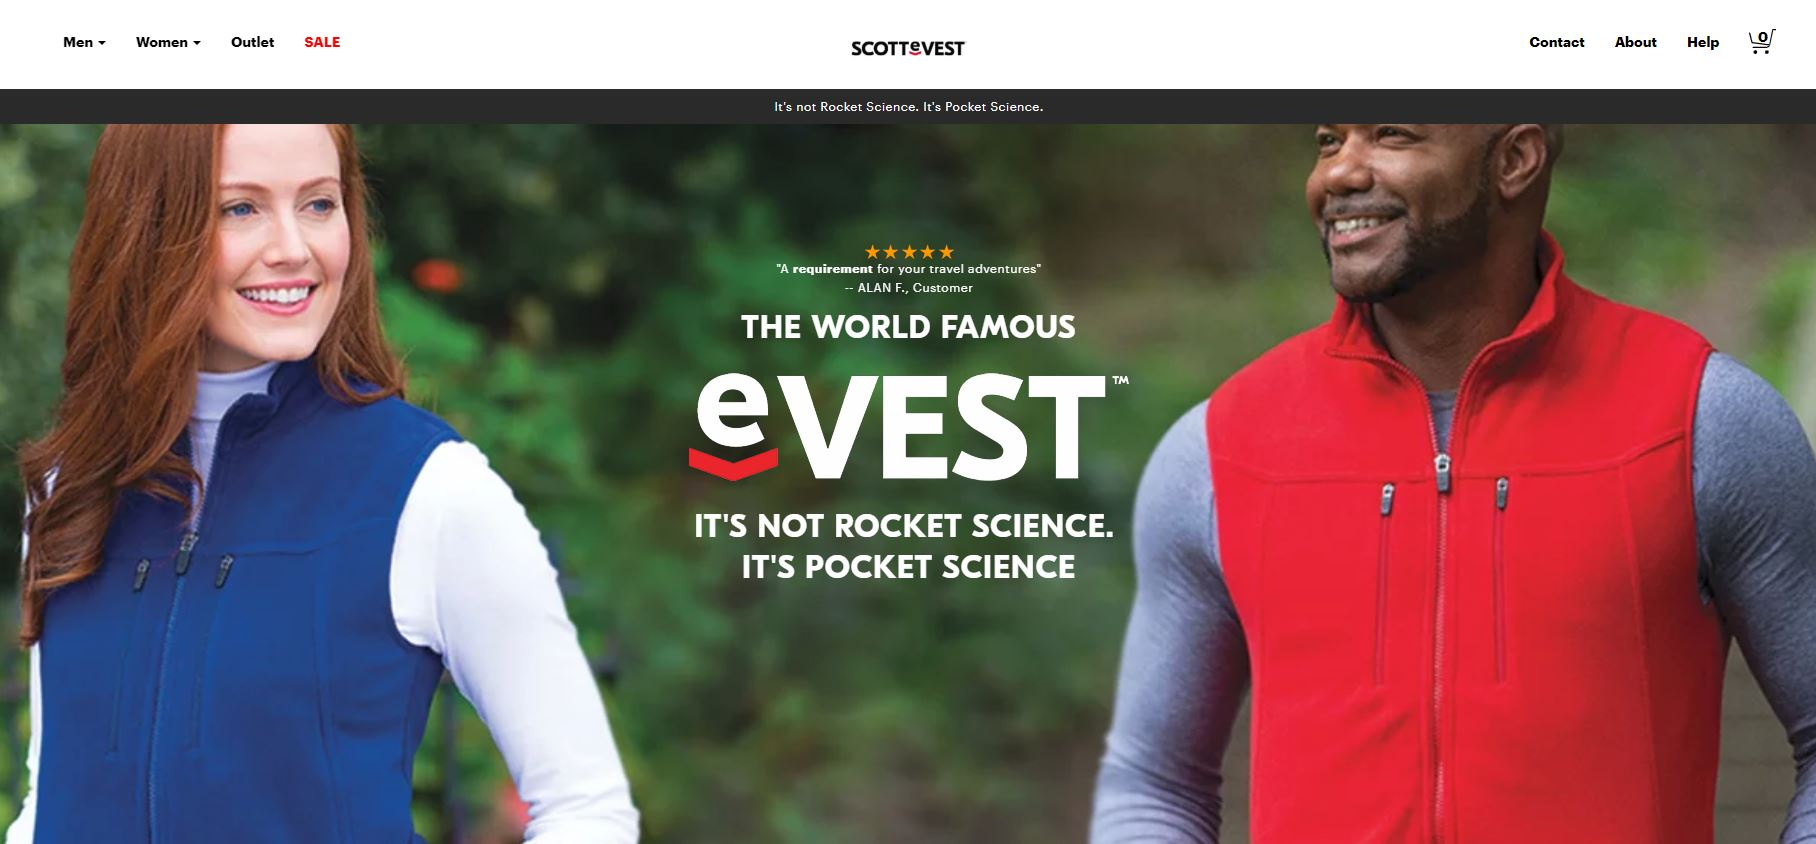 ScotteVest Website Homepage - Danielle B